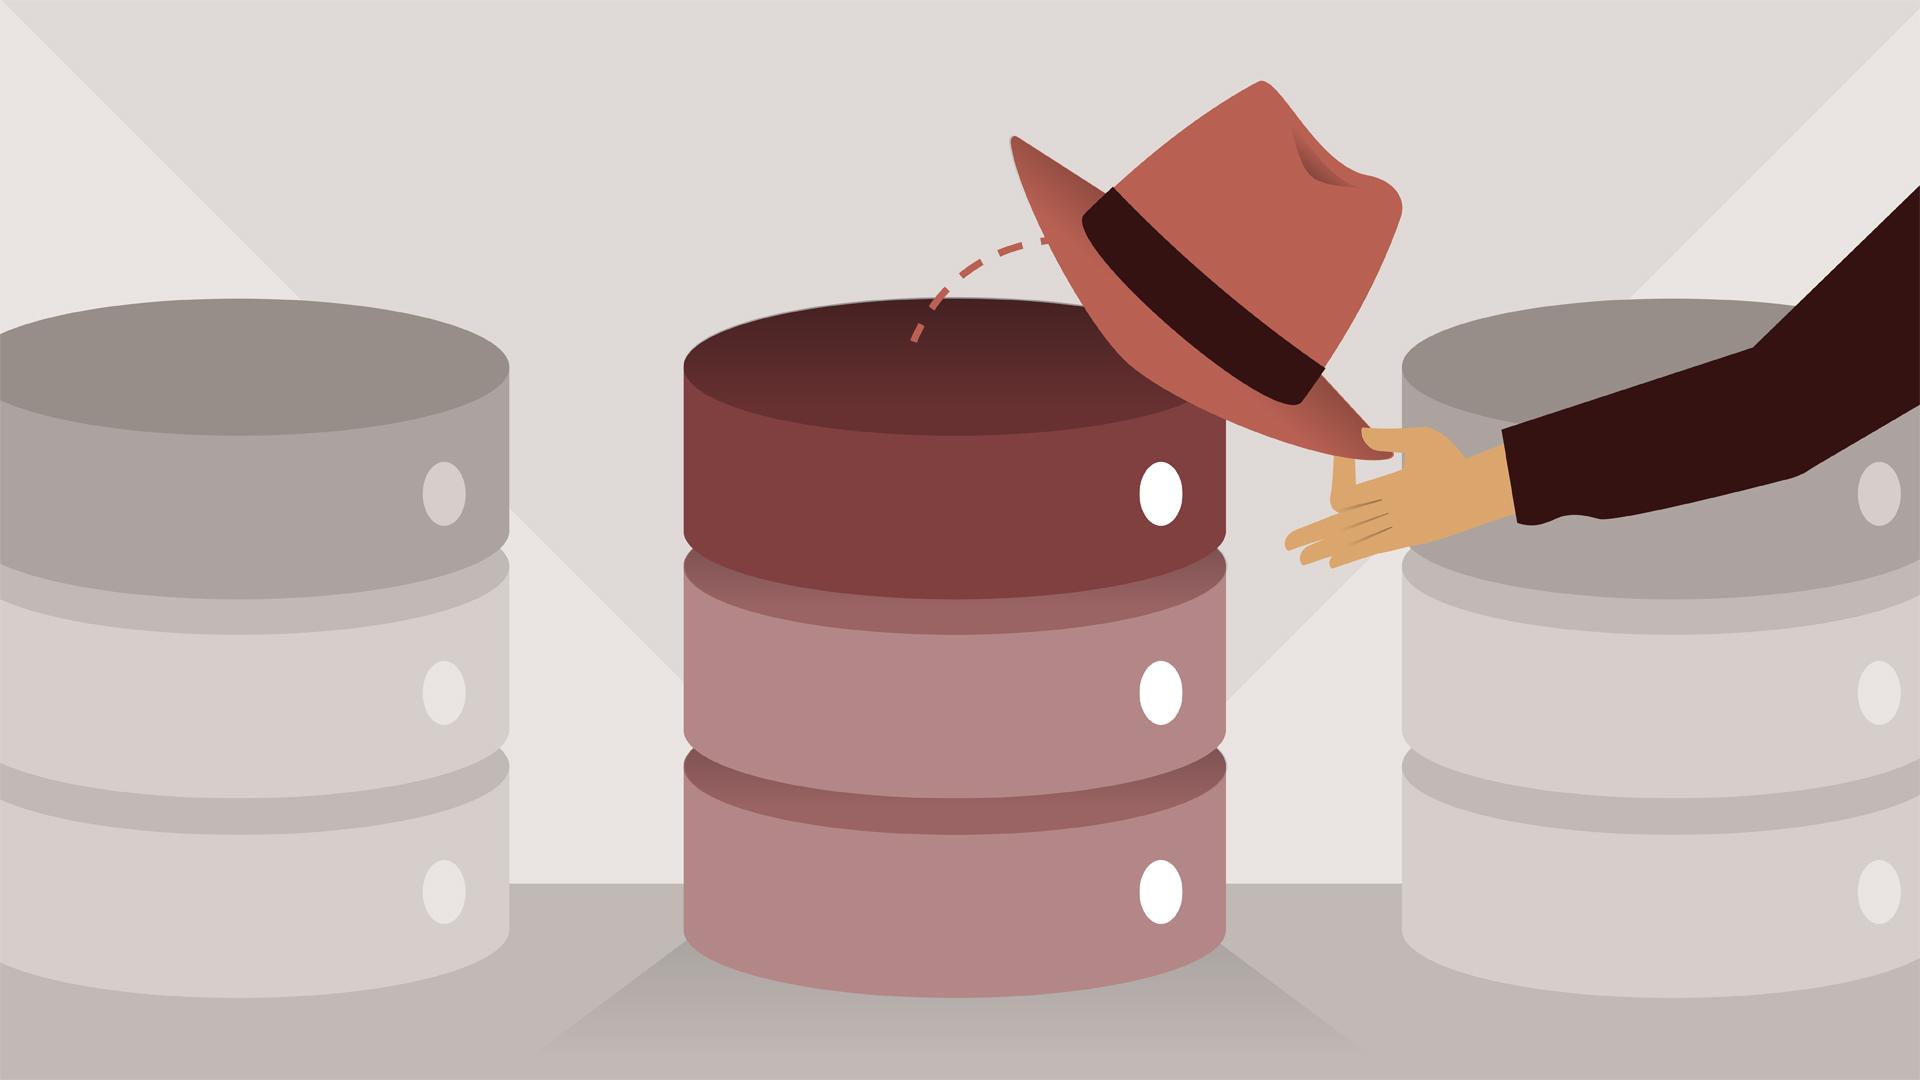 Database server administration with MariaDB: Linux System Engineer: Database Servers Using MariaDB